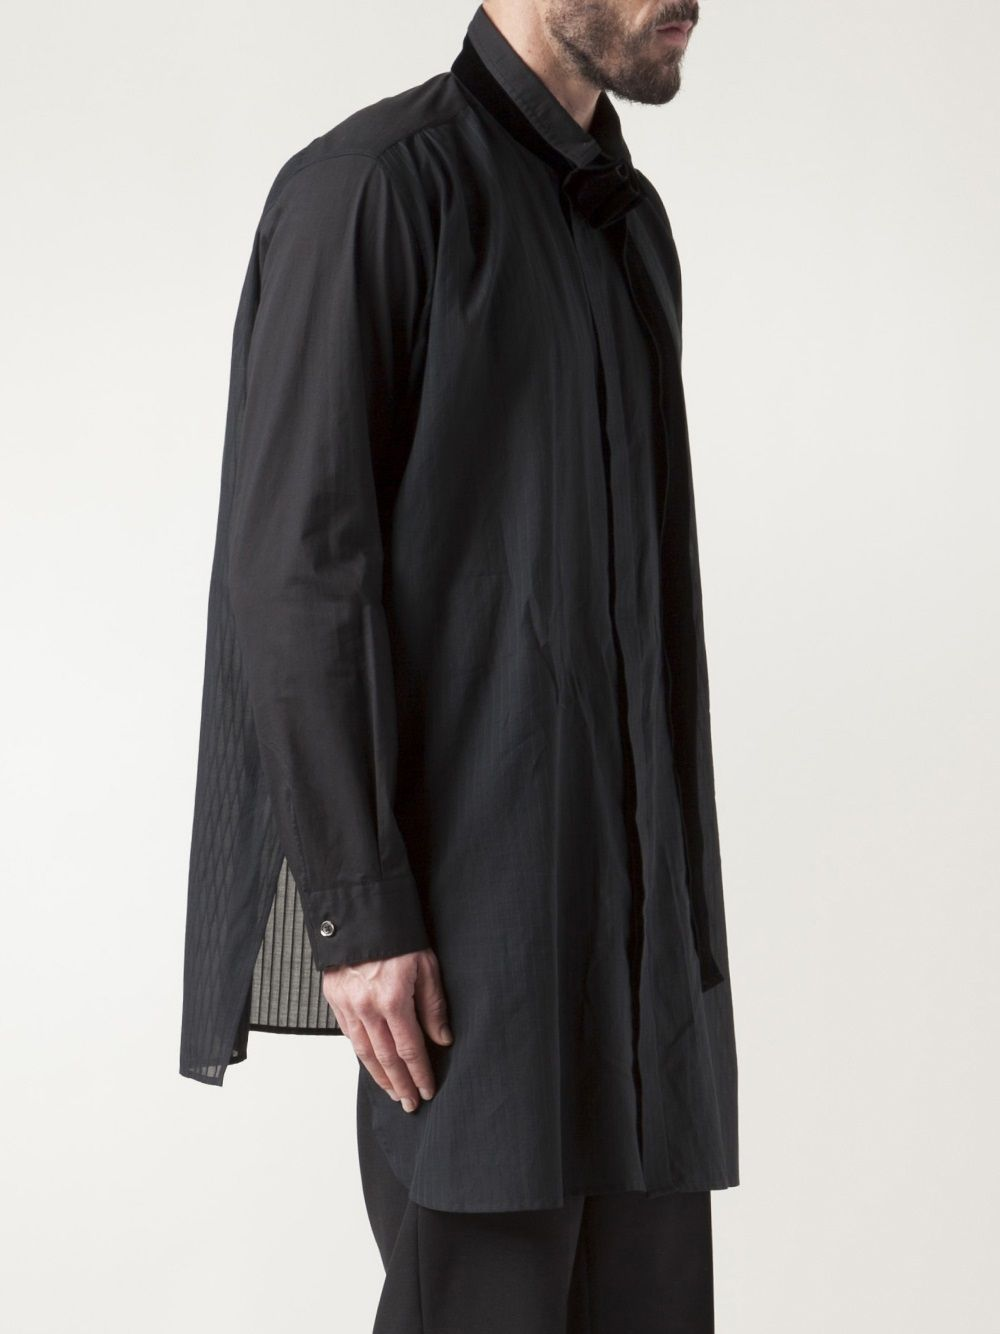 Ann Demeulemeester Striped Shirt H. H. H. Lorenzo Farfetch 0687e0